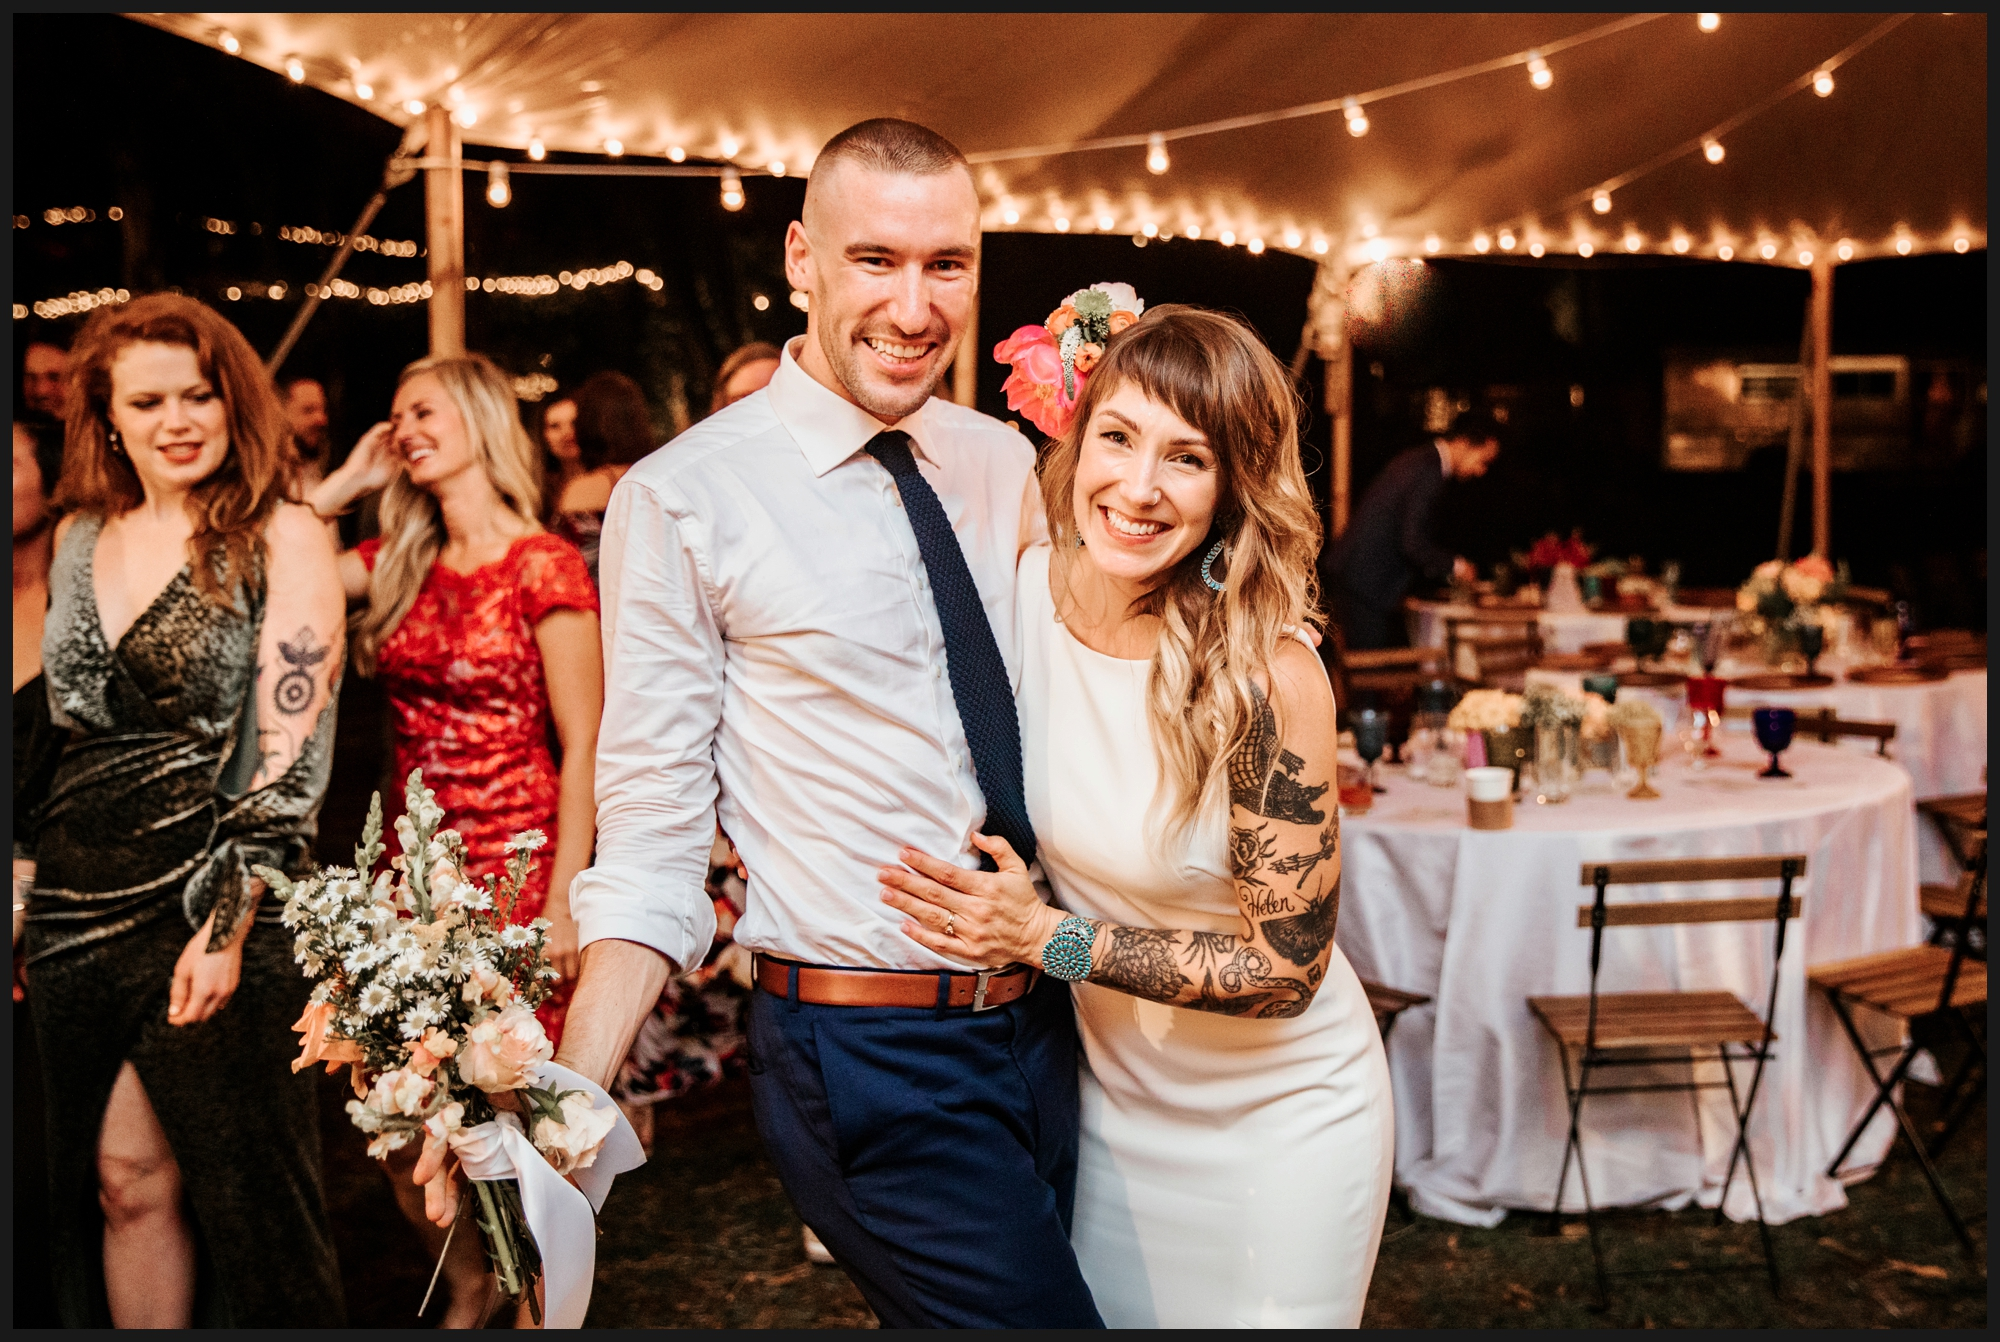 Orlando-Wedding-Photographer-destination-wedding-photographer-florida-wedding-photographer-bohemian-wedding-photographer_2054.jpg